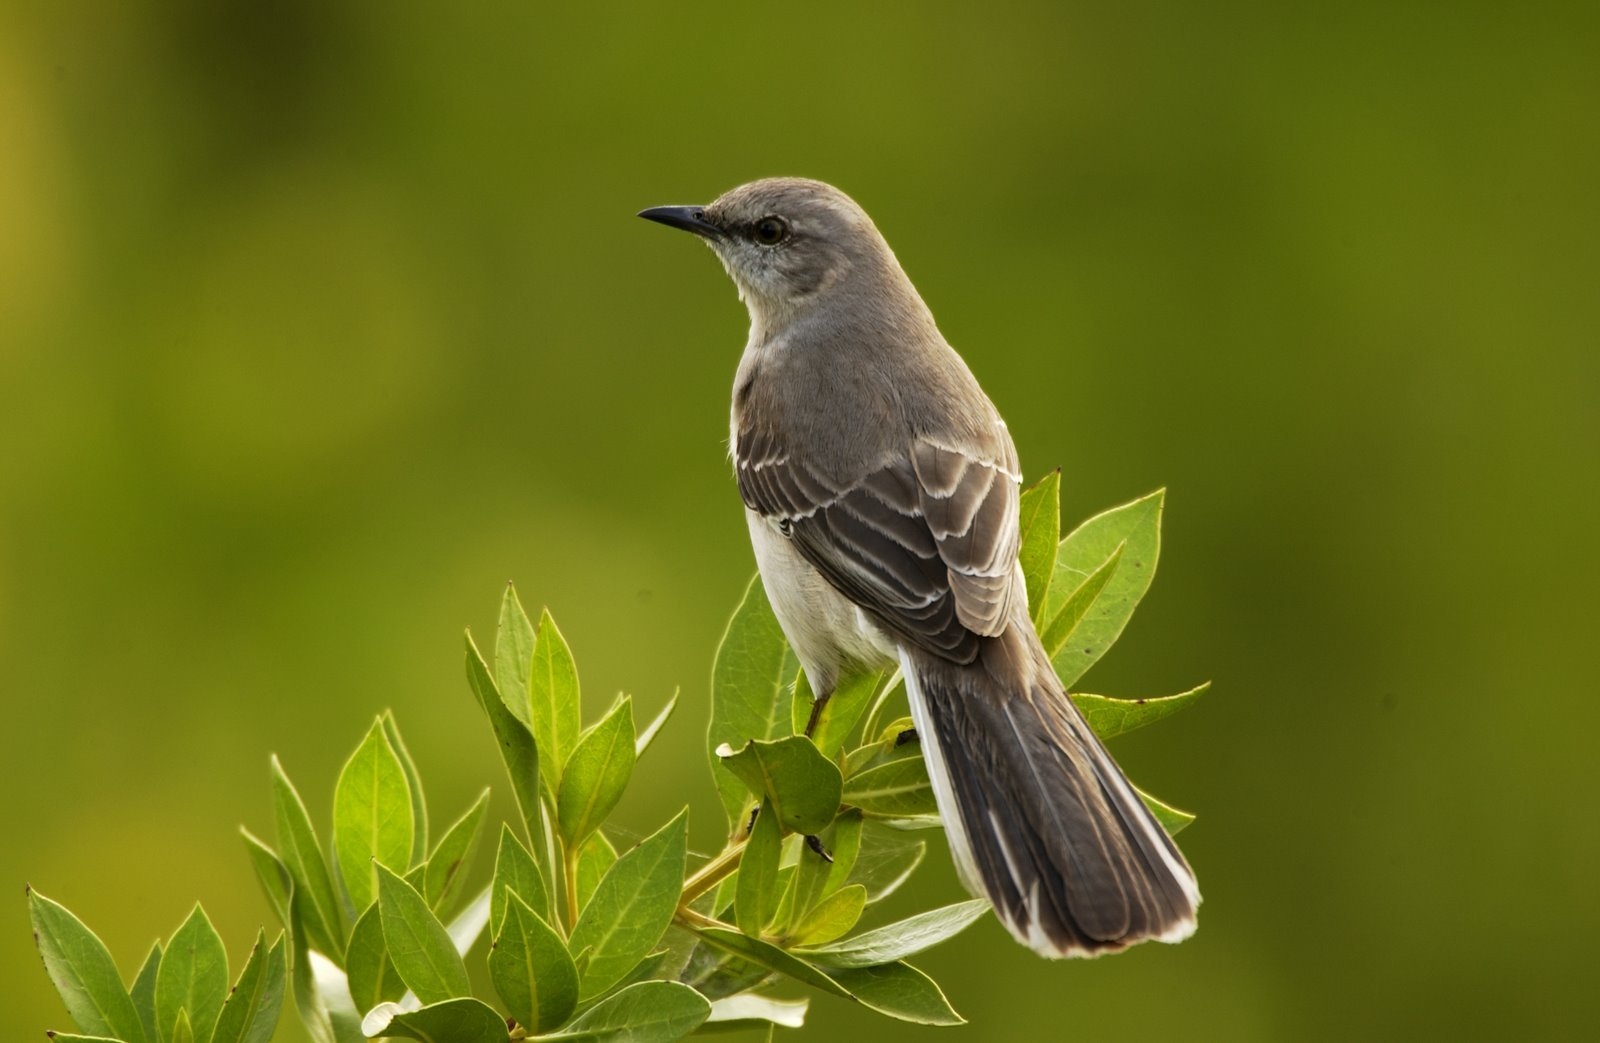 Blackbird clipart mockingbird Clipart mockingbird Dead clipart use